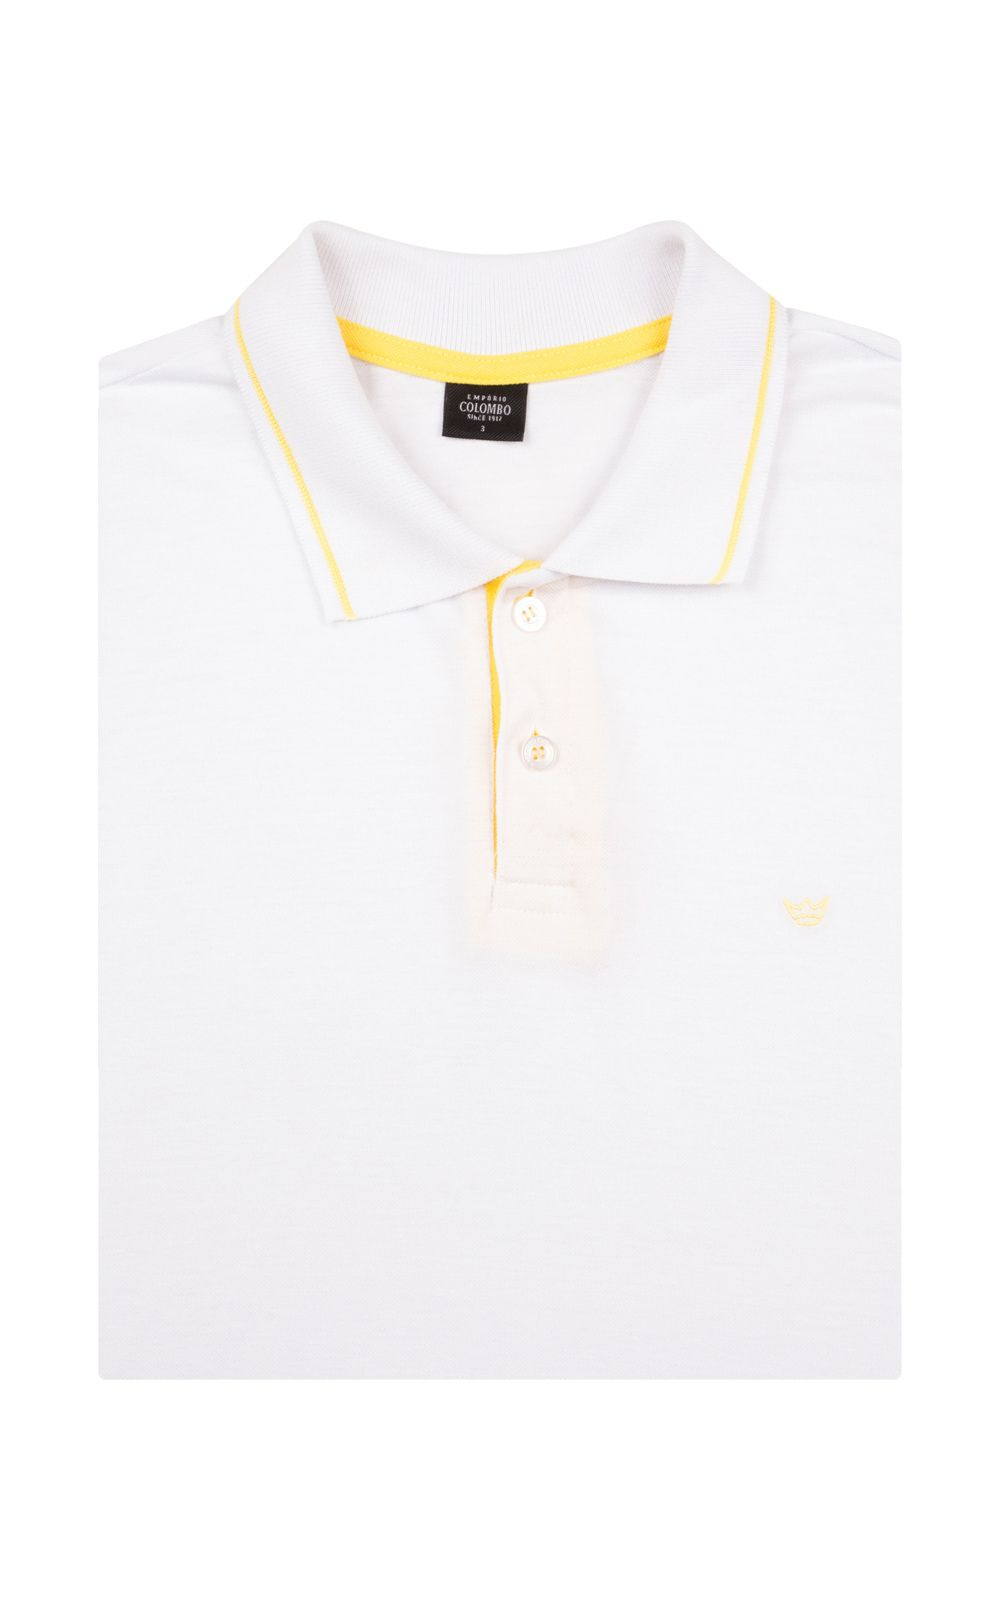 Foto 4 - Camisa Polo Masculina Branca Detalhada